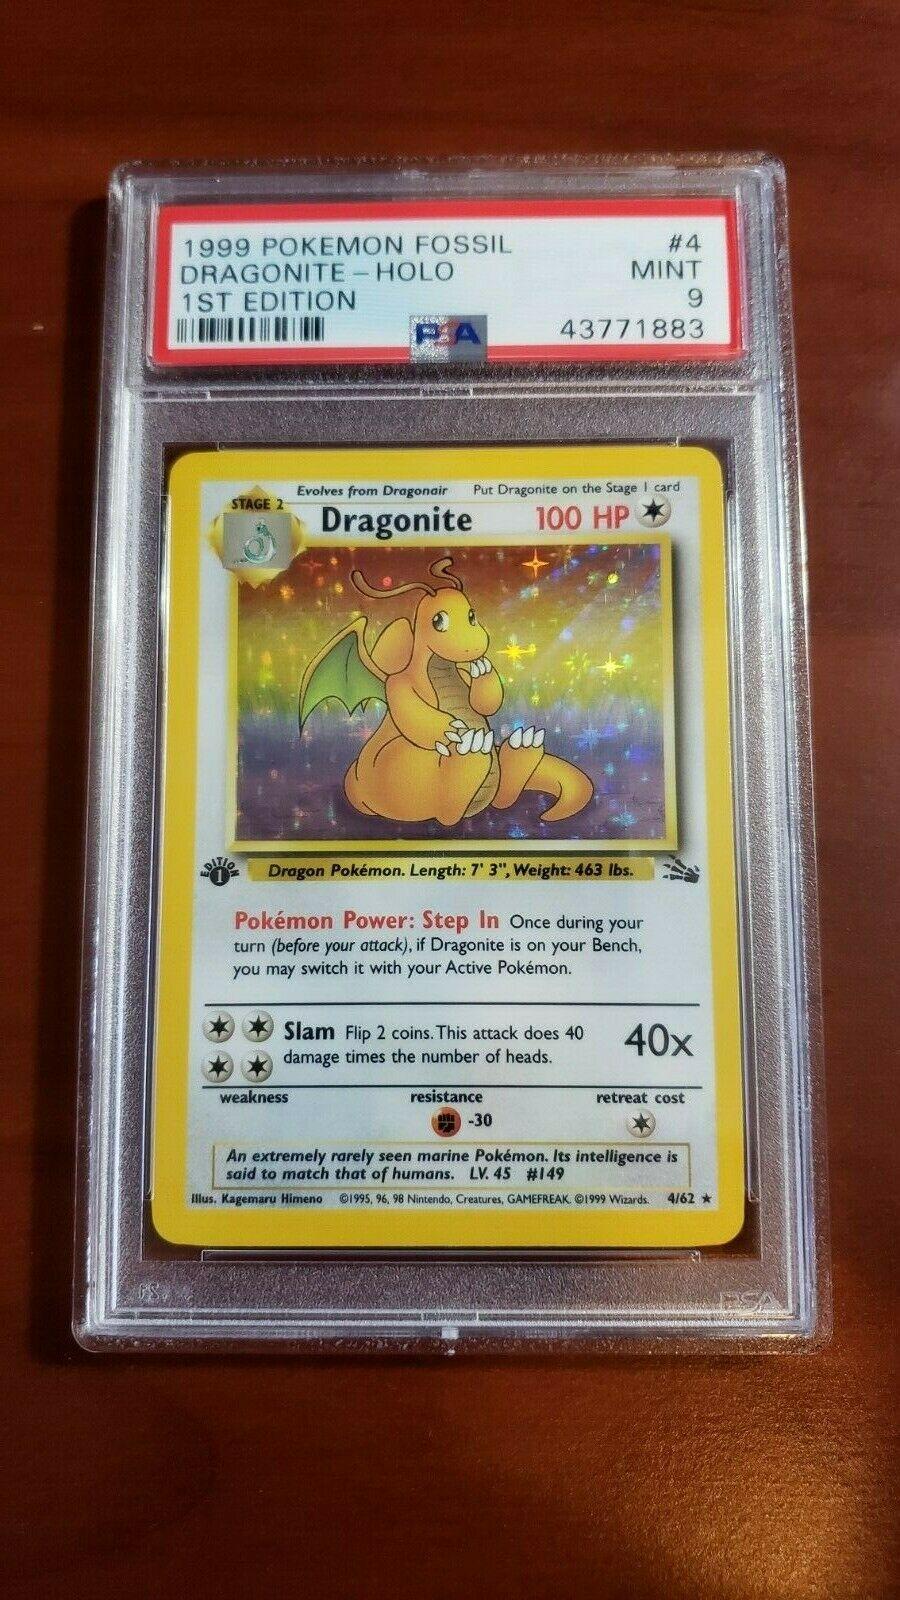 PSA 9 Mint Dragonite 1st edition Holo Fossil 1999 Pokemon Card 462